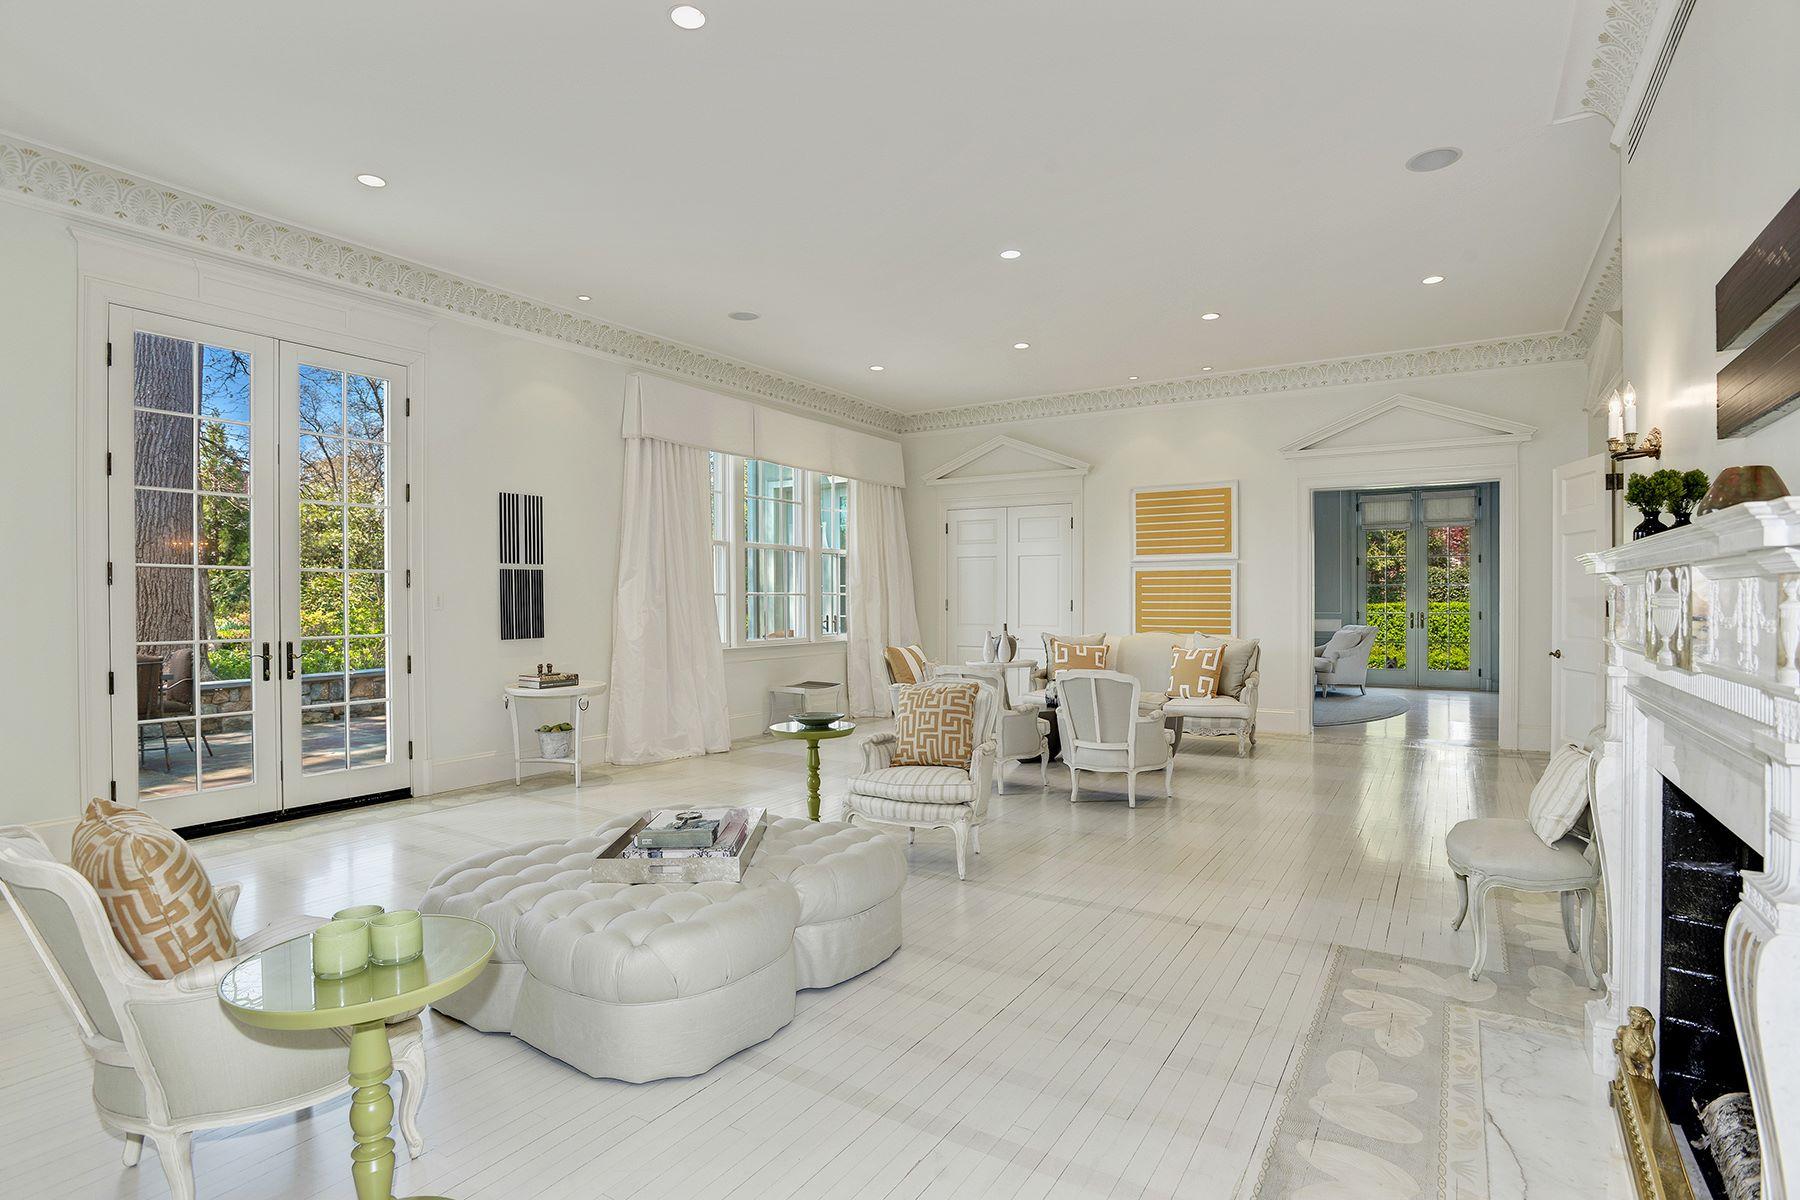 Additional photo for property listing at 5215 Edgemoor Lane, Bethesda 5215 Edgemoor Ln Bethesda, Maryland 20814 Verenigde Staten